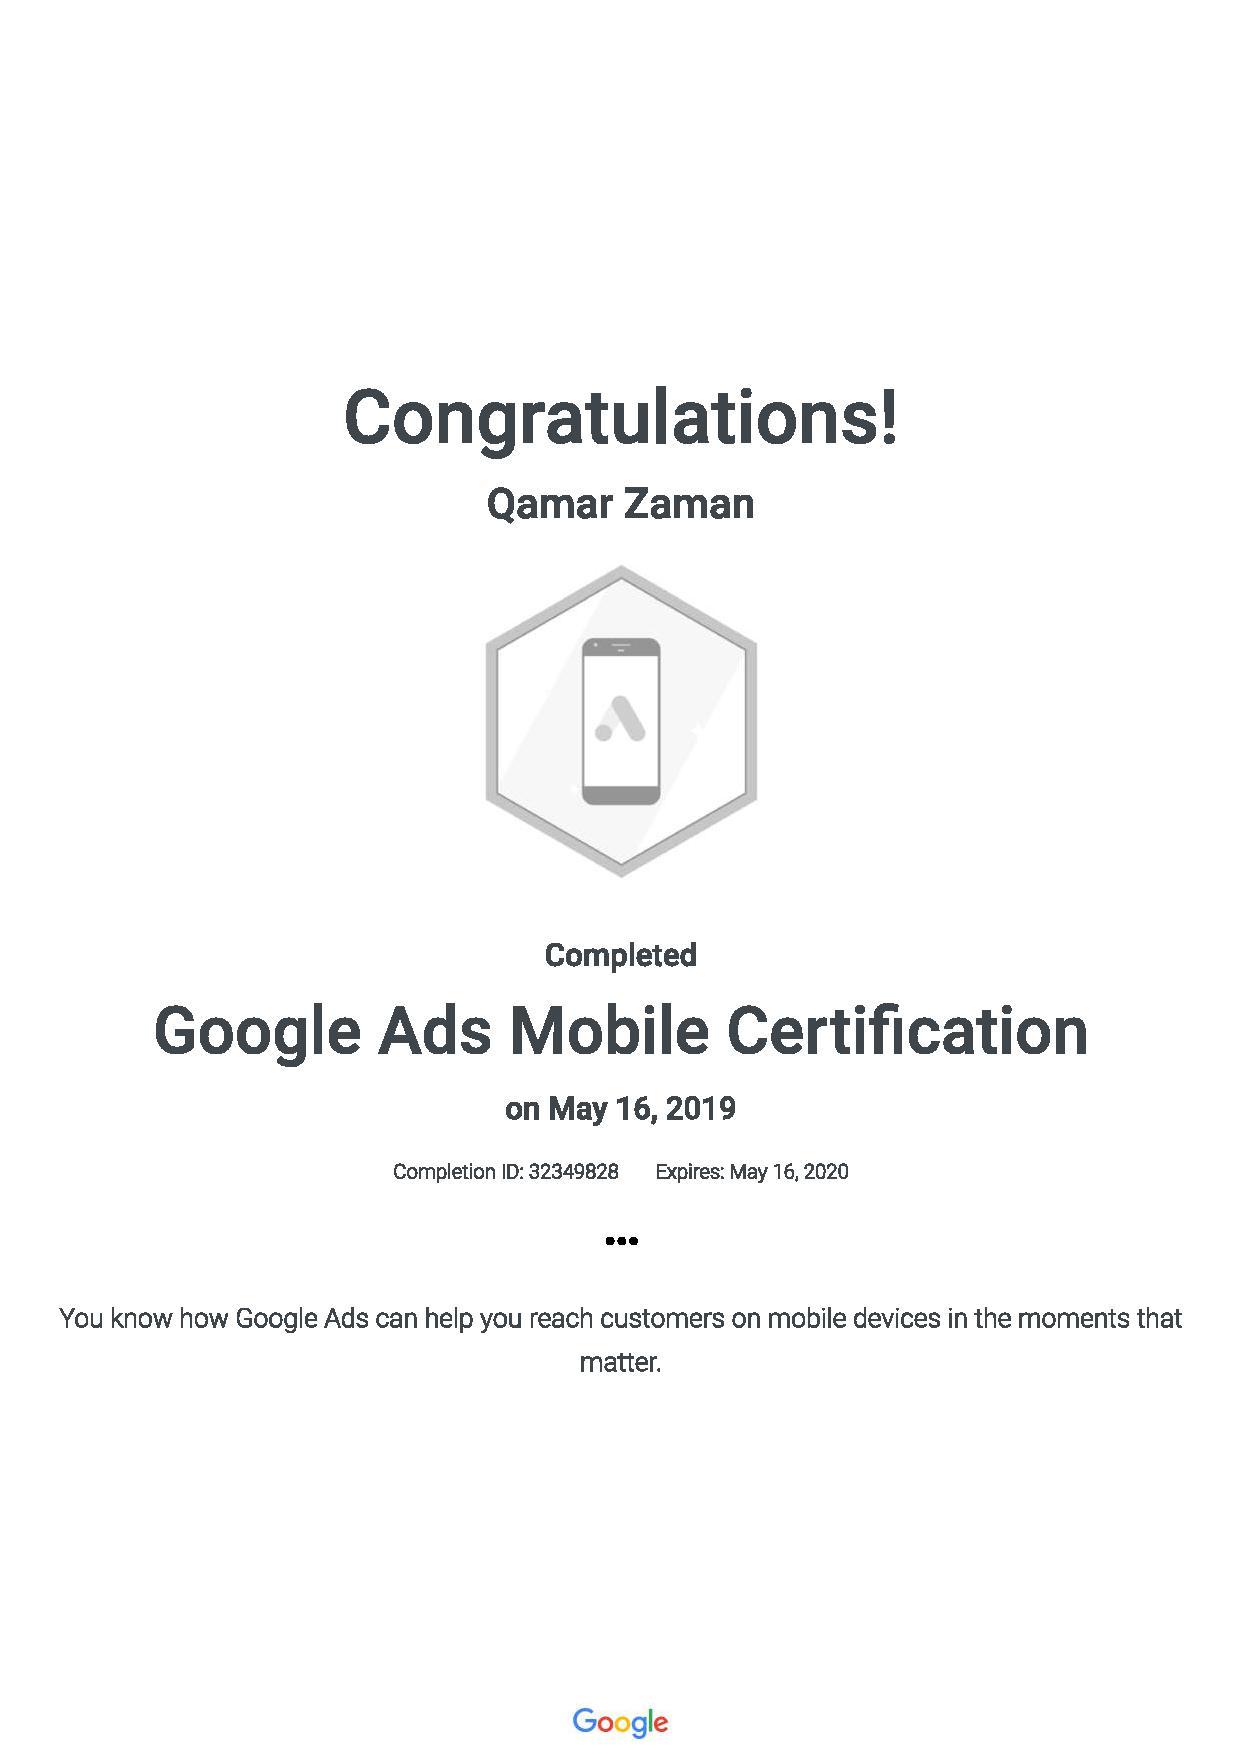 Google Ads Mobile Certification 201905